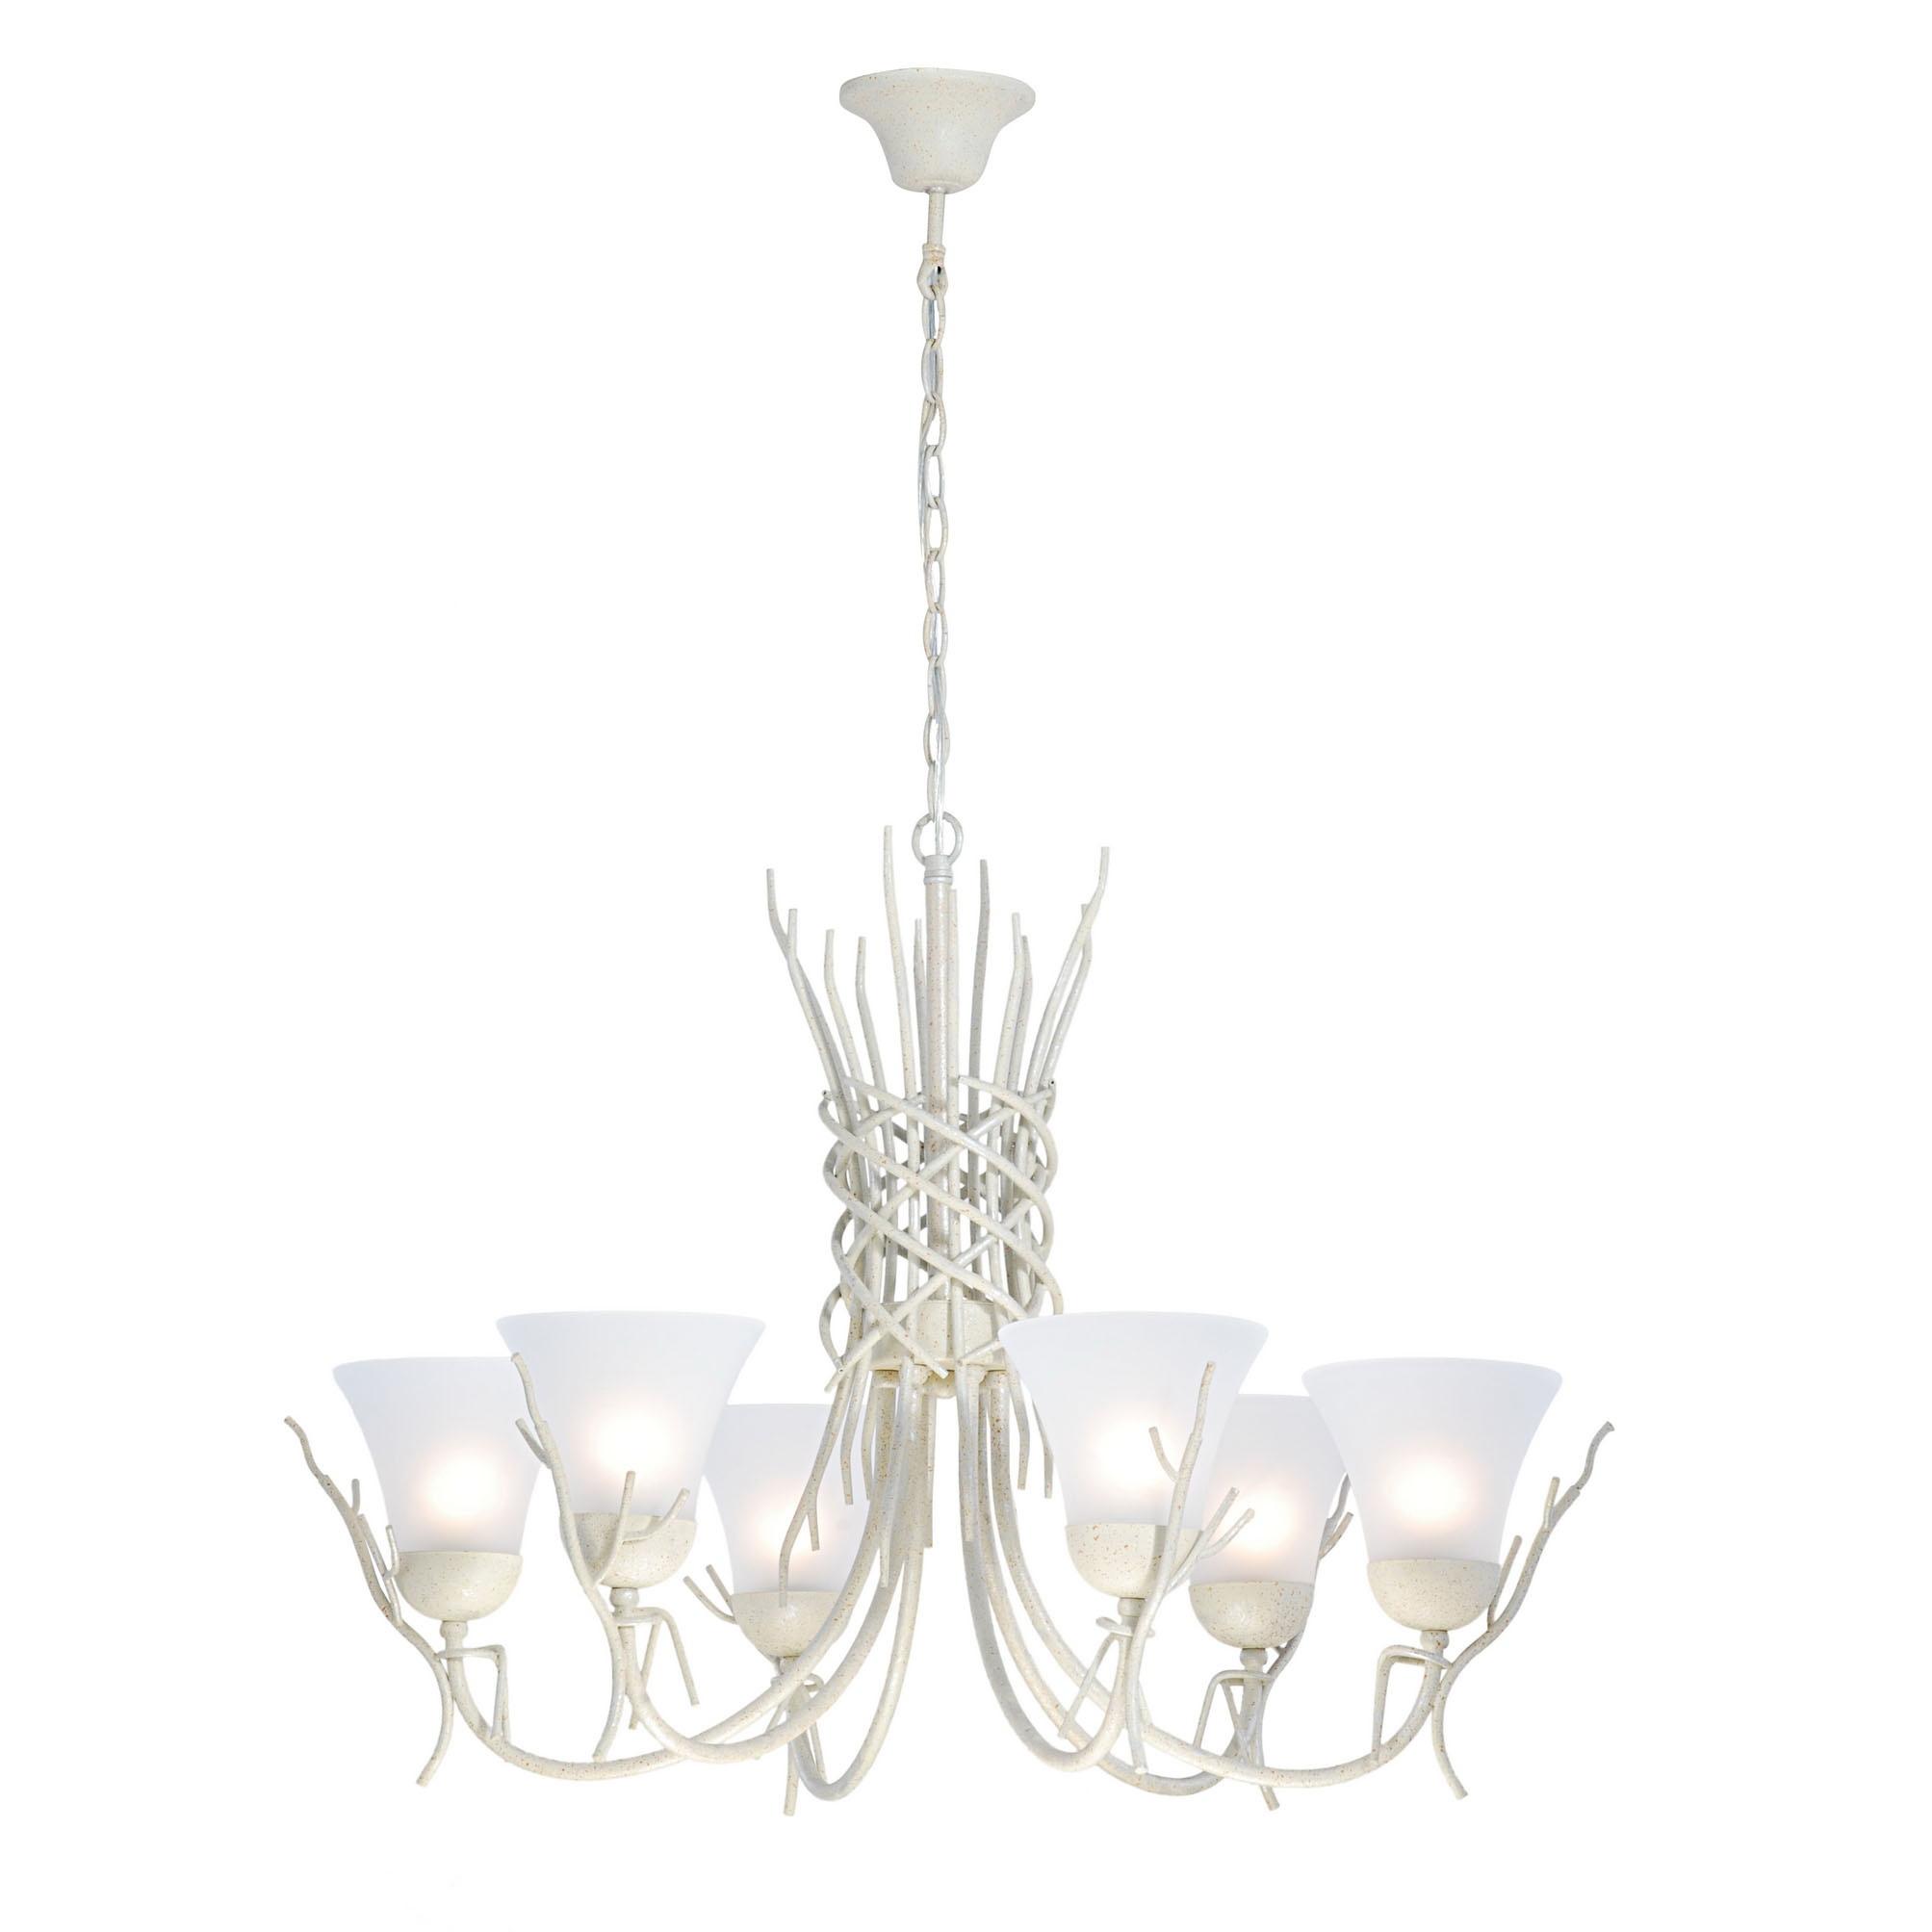 Люстра Arte lamp Brushwood a4111lm-6wa люстра divinare diana 8111 01 lm 6